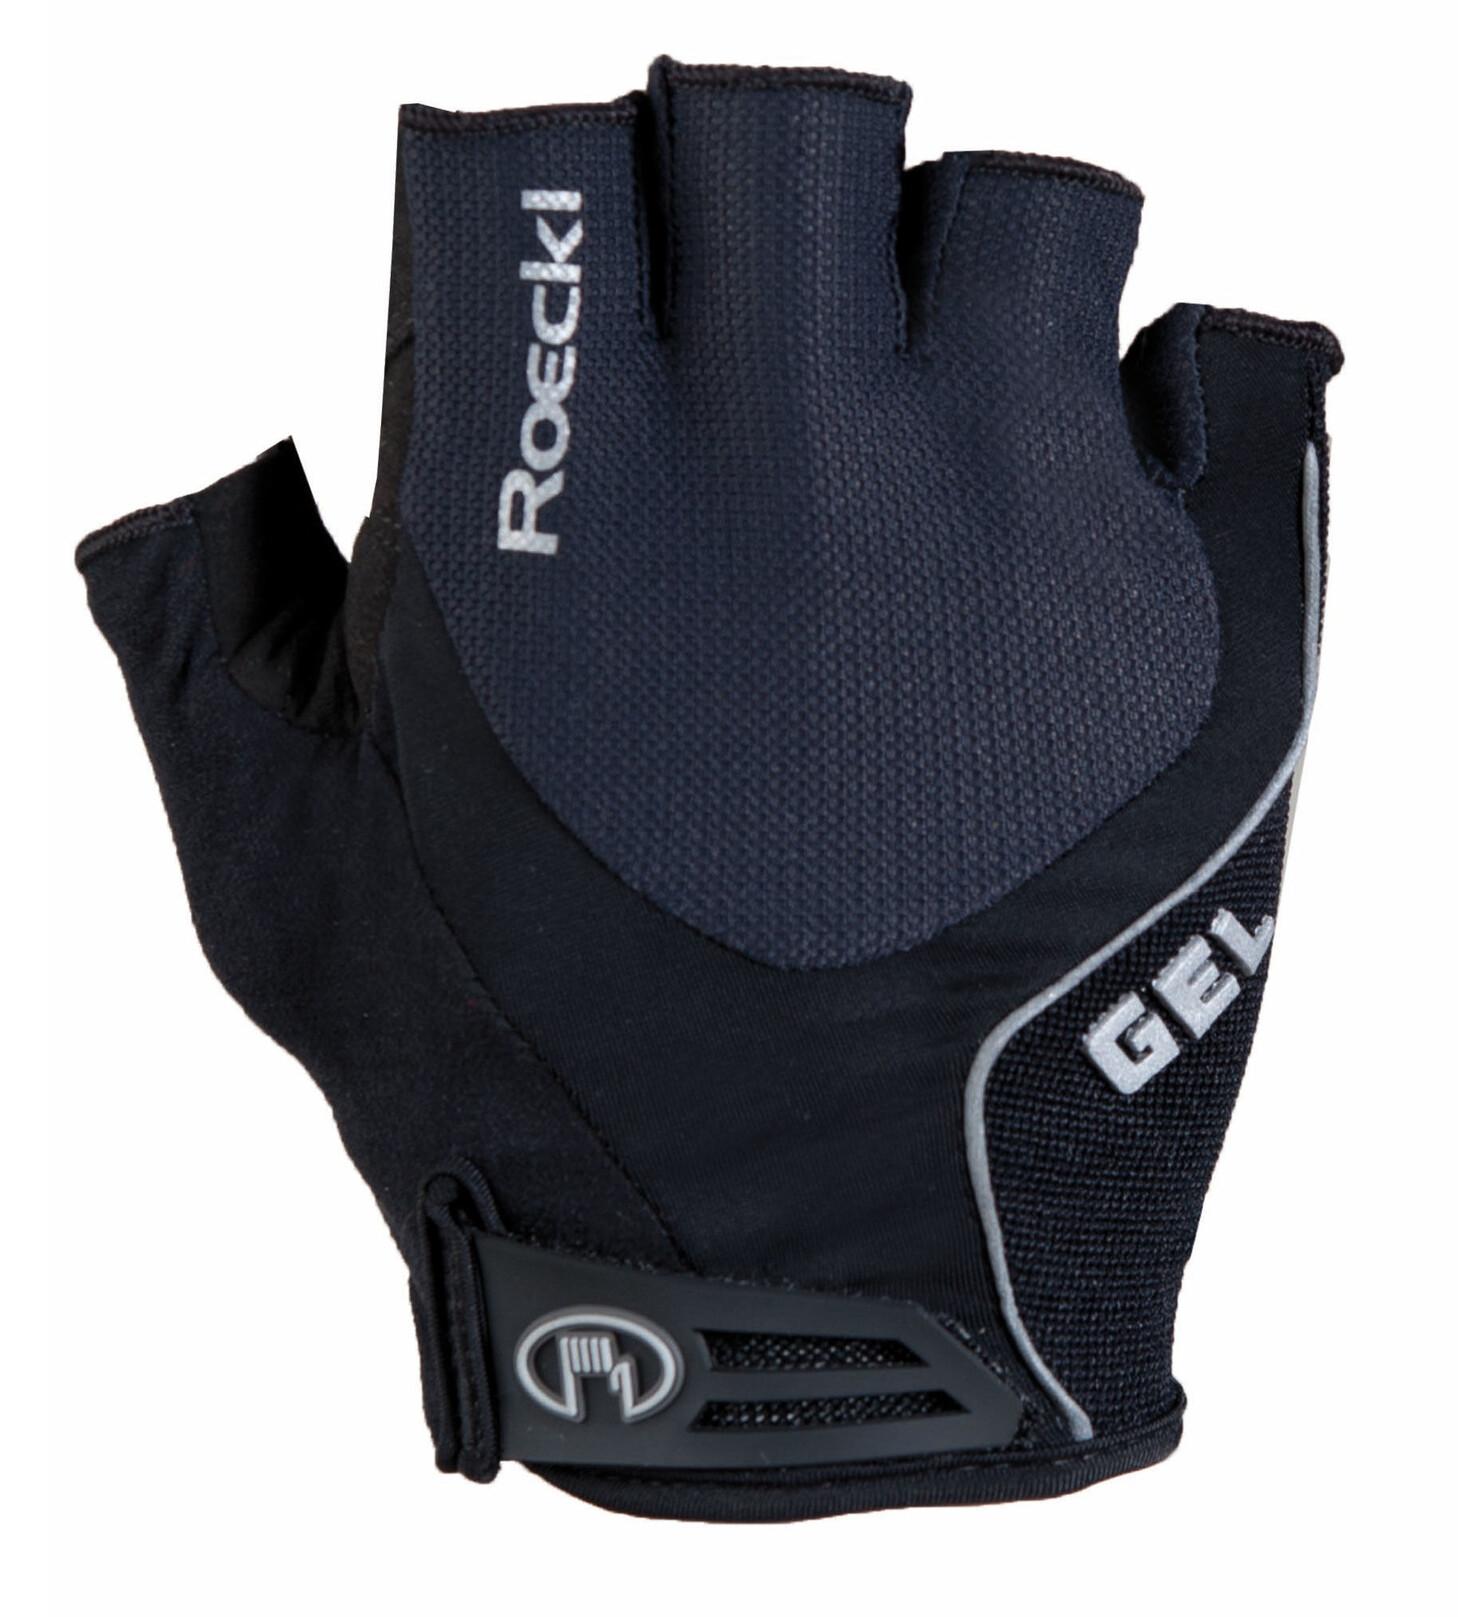 Sugoi Women's Biking Cycling MTB Off Road Gloves Gray//Black Size L NEW